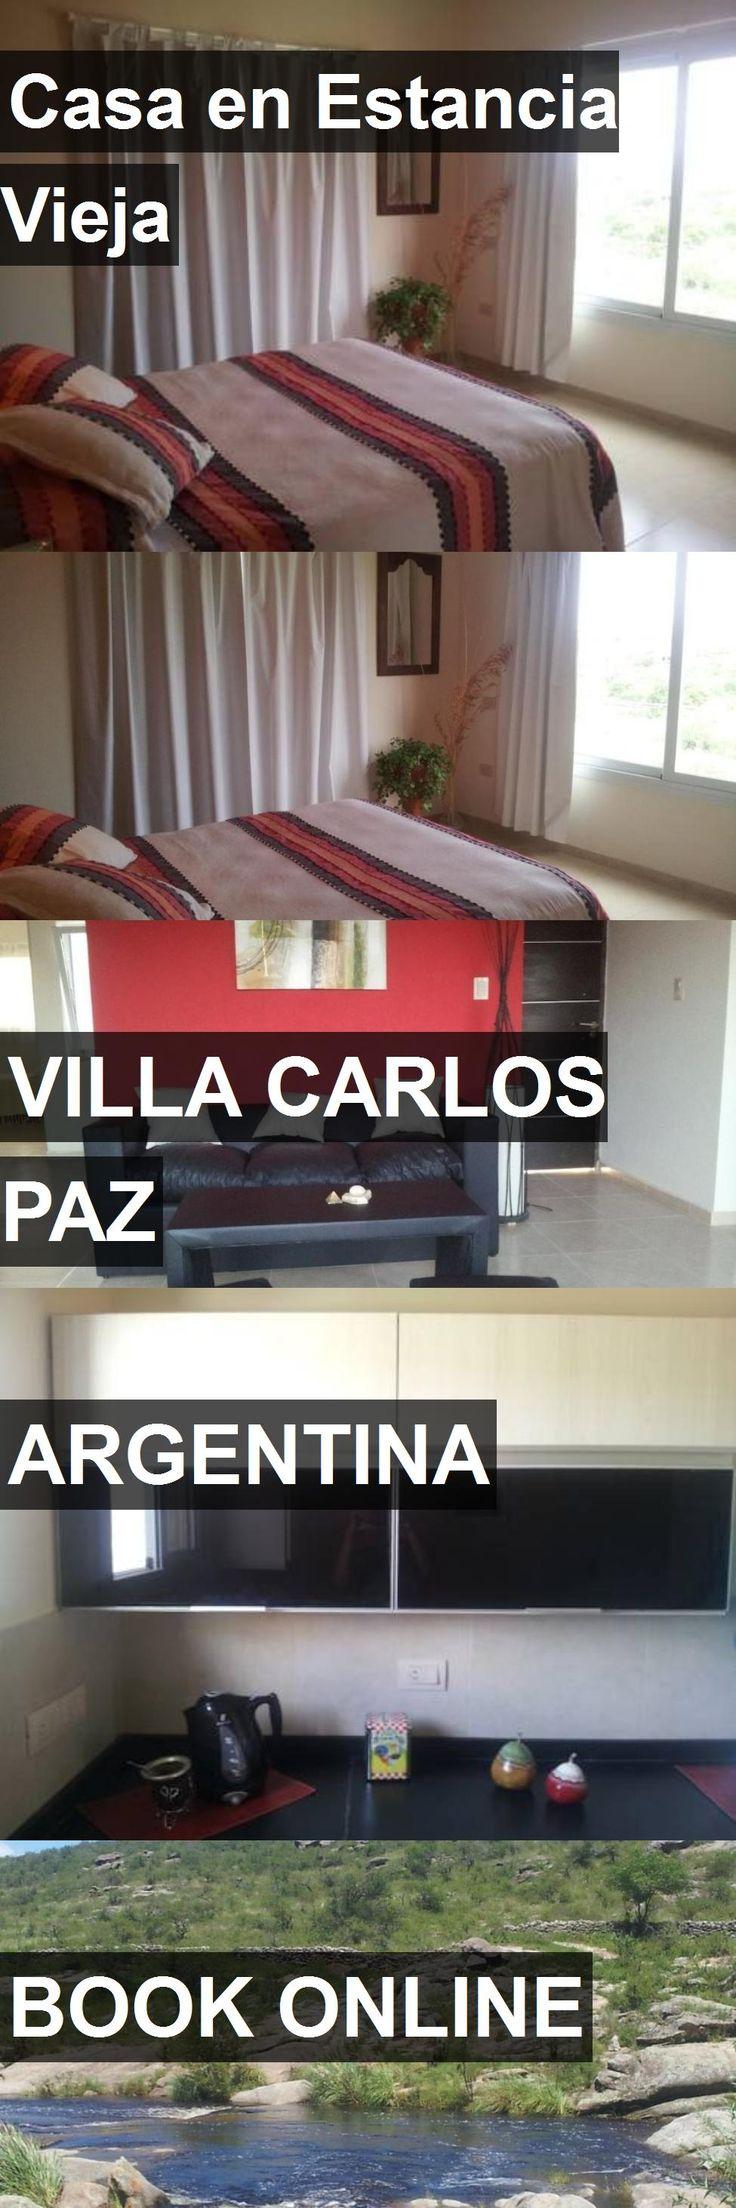 Hotel Casa en Estancia Vieja in Villa Carlos Paz, Argentina. For more information, photos, reviews and best prices please follow the link. #Argentina #VillaCarlosPaz #travel #vacation #hotel